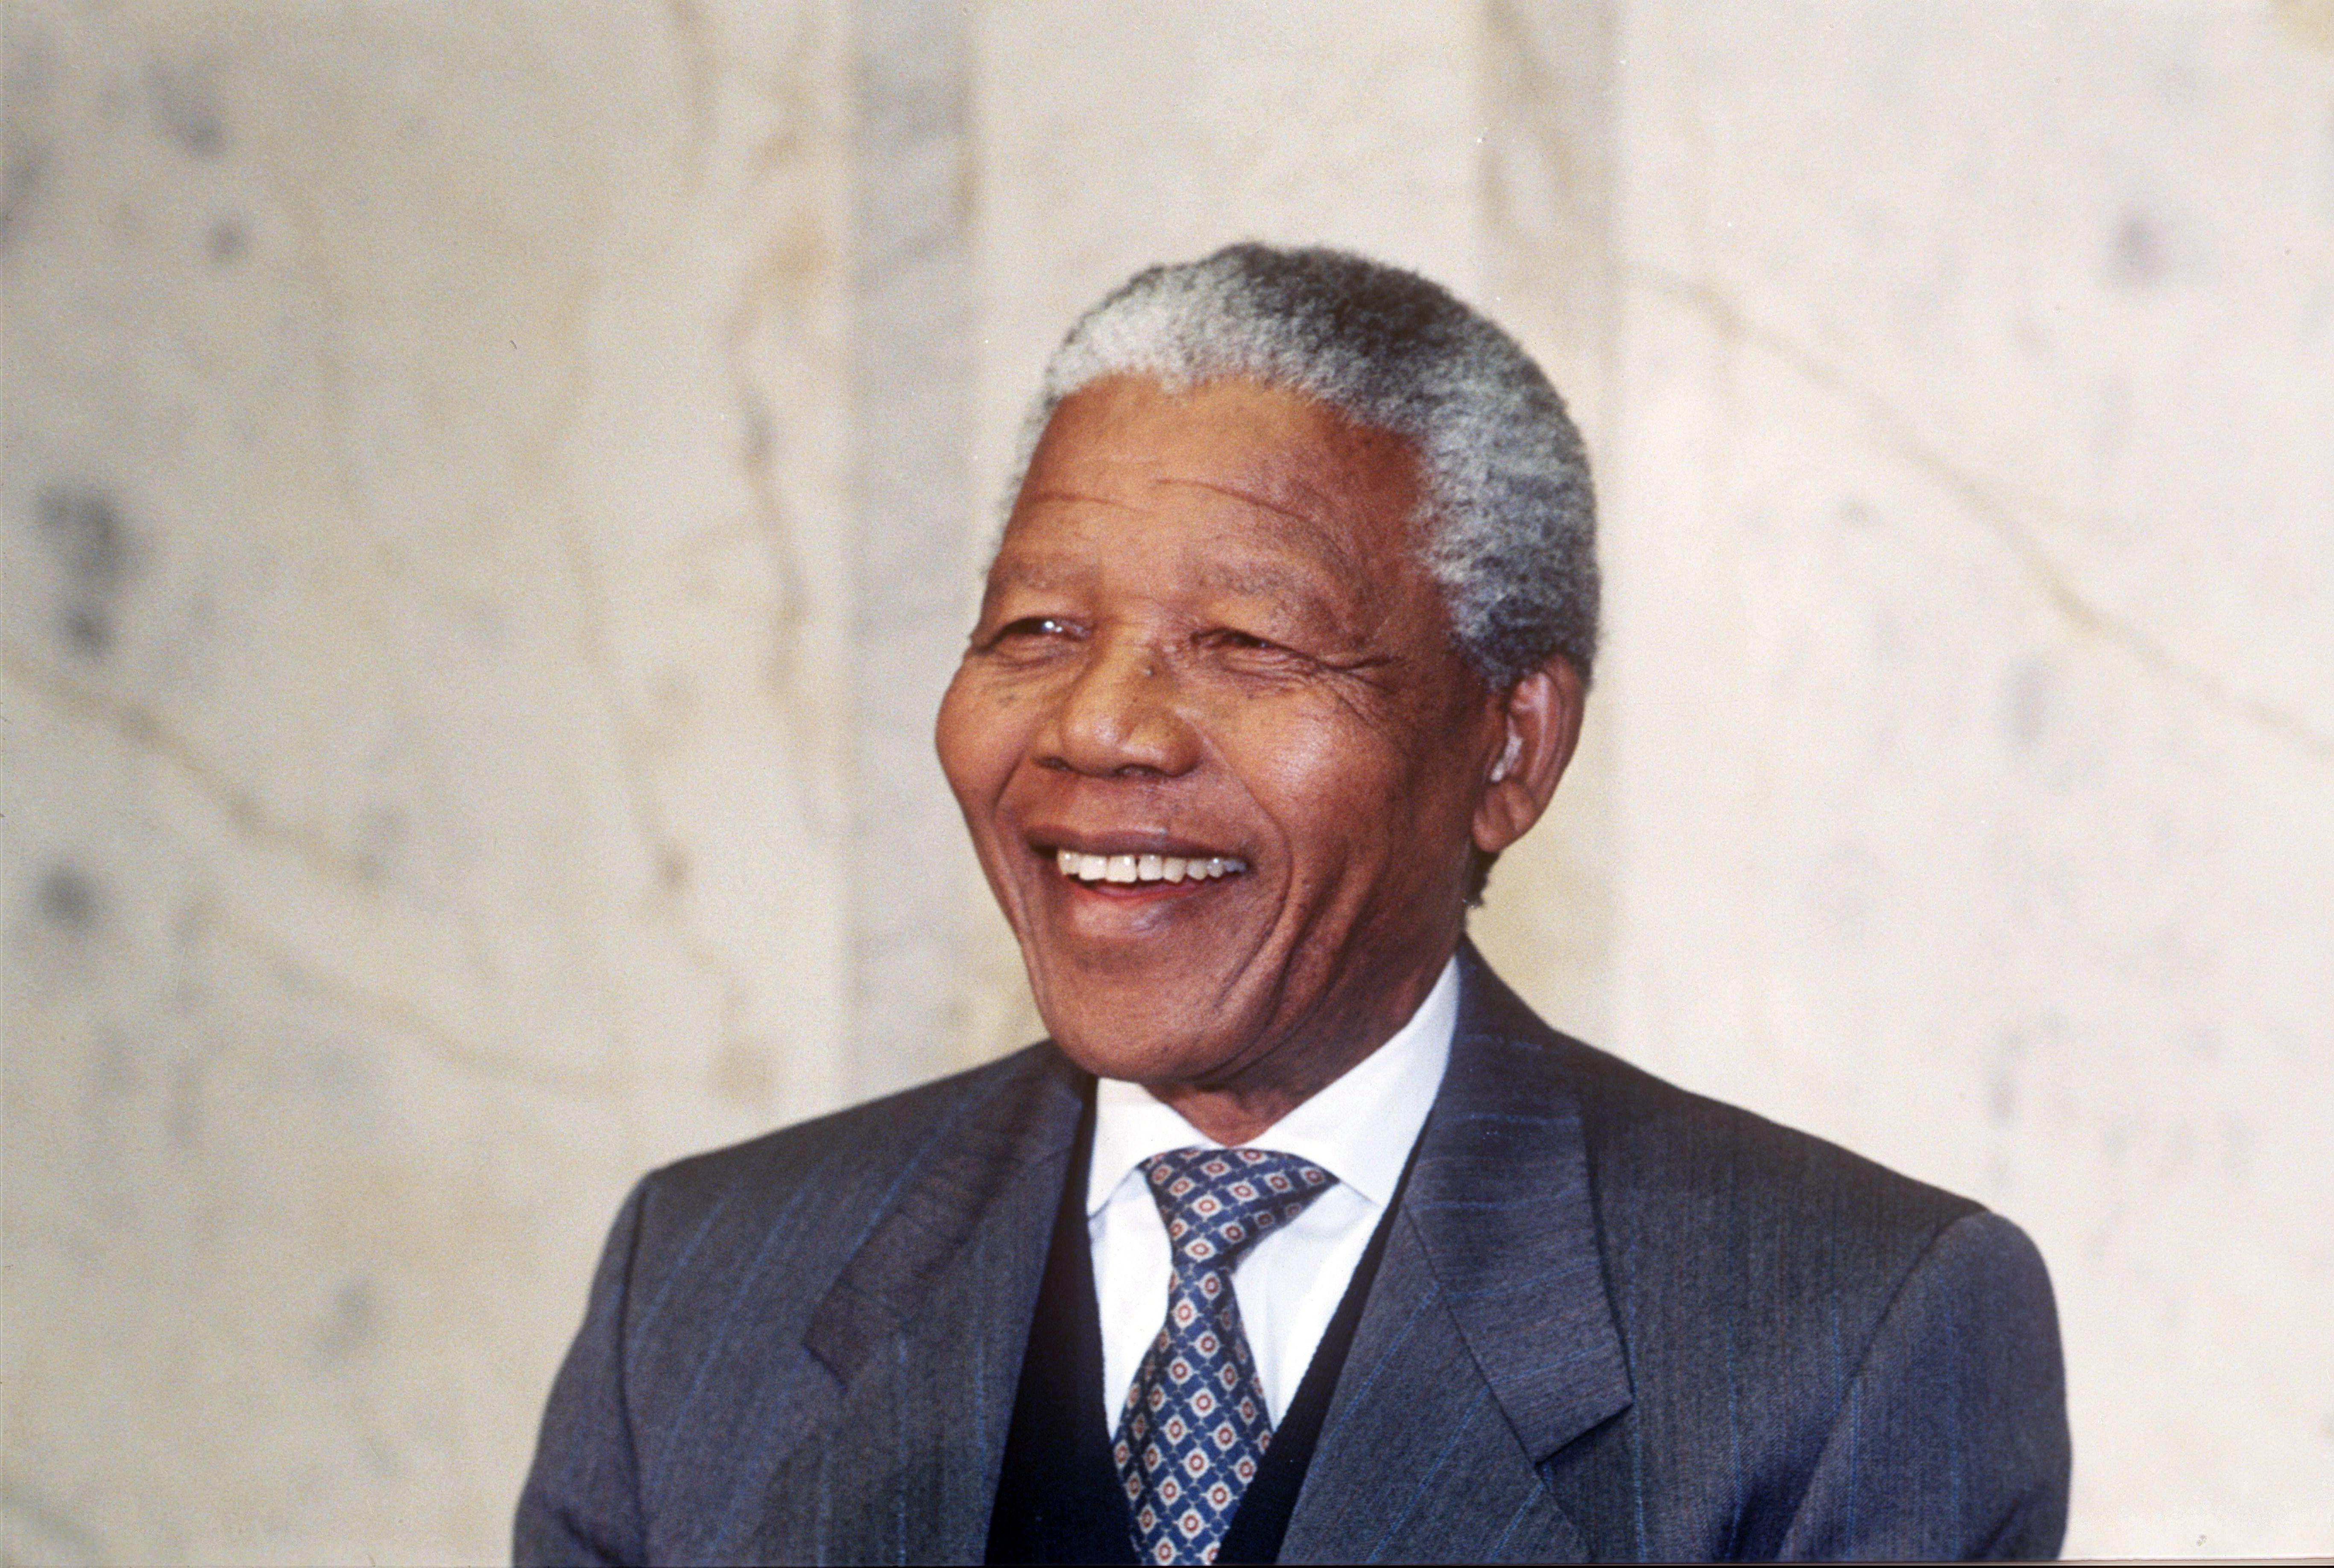 Mandatory Credit: Photo by Ibl/Shutterstock (223659b) Nelson Mandela F W DE KLERK AND NELSON MANDELA MEETING KING CARL GUSTAF OF SWEDEN IN STOCKHOLM, SWEDEN - 1993 President of South Africa from 1994 to 1999